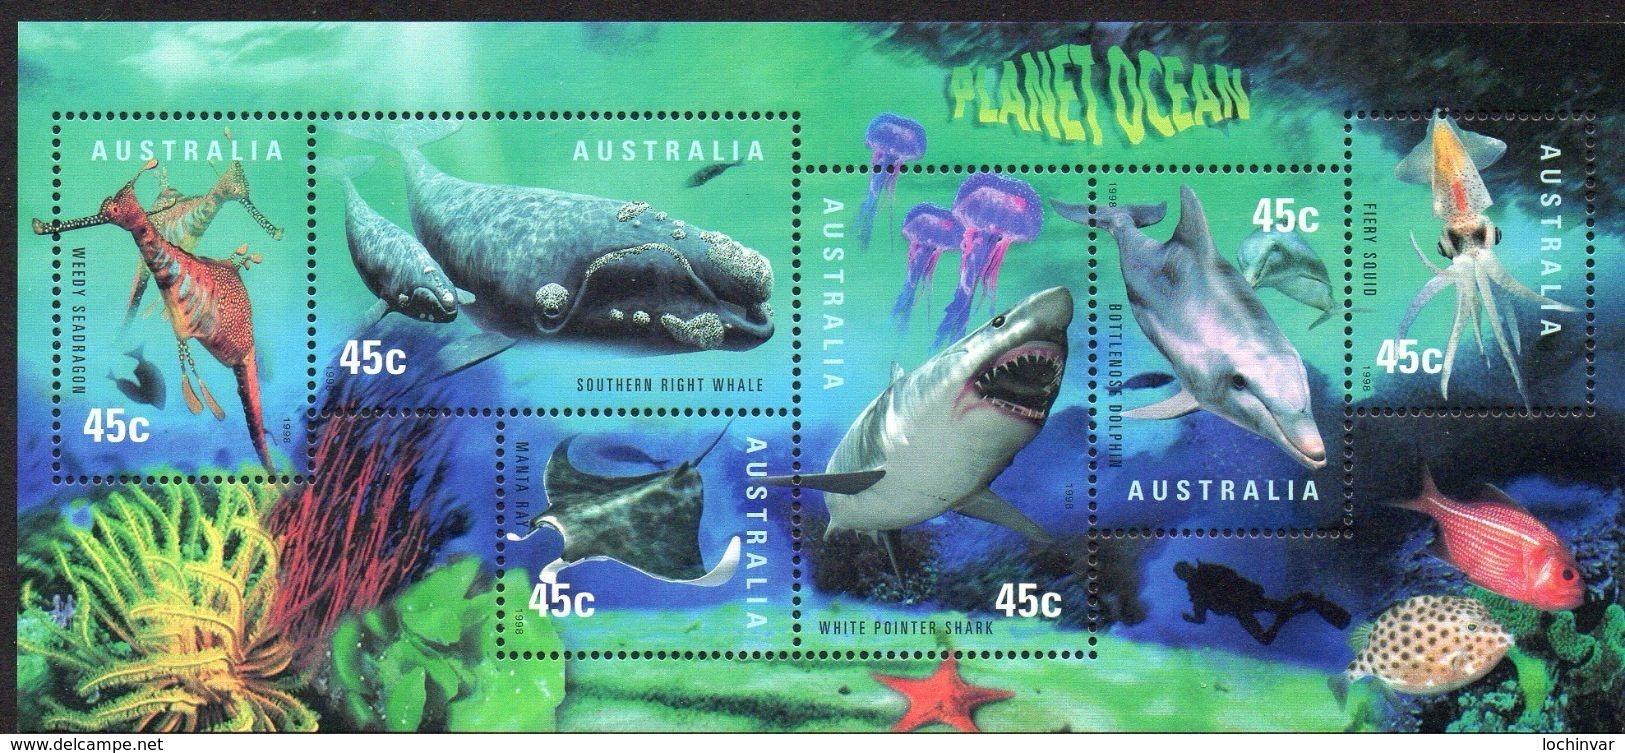 AUSTRALIA, 1998 PLANET OCEAN MINISHEET MNH - 1990-99 Elizabeth II